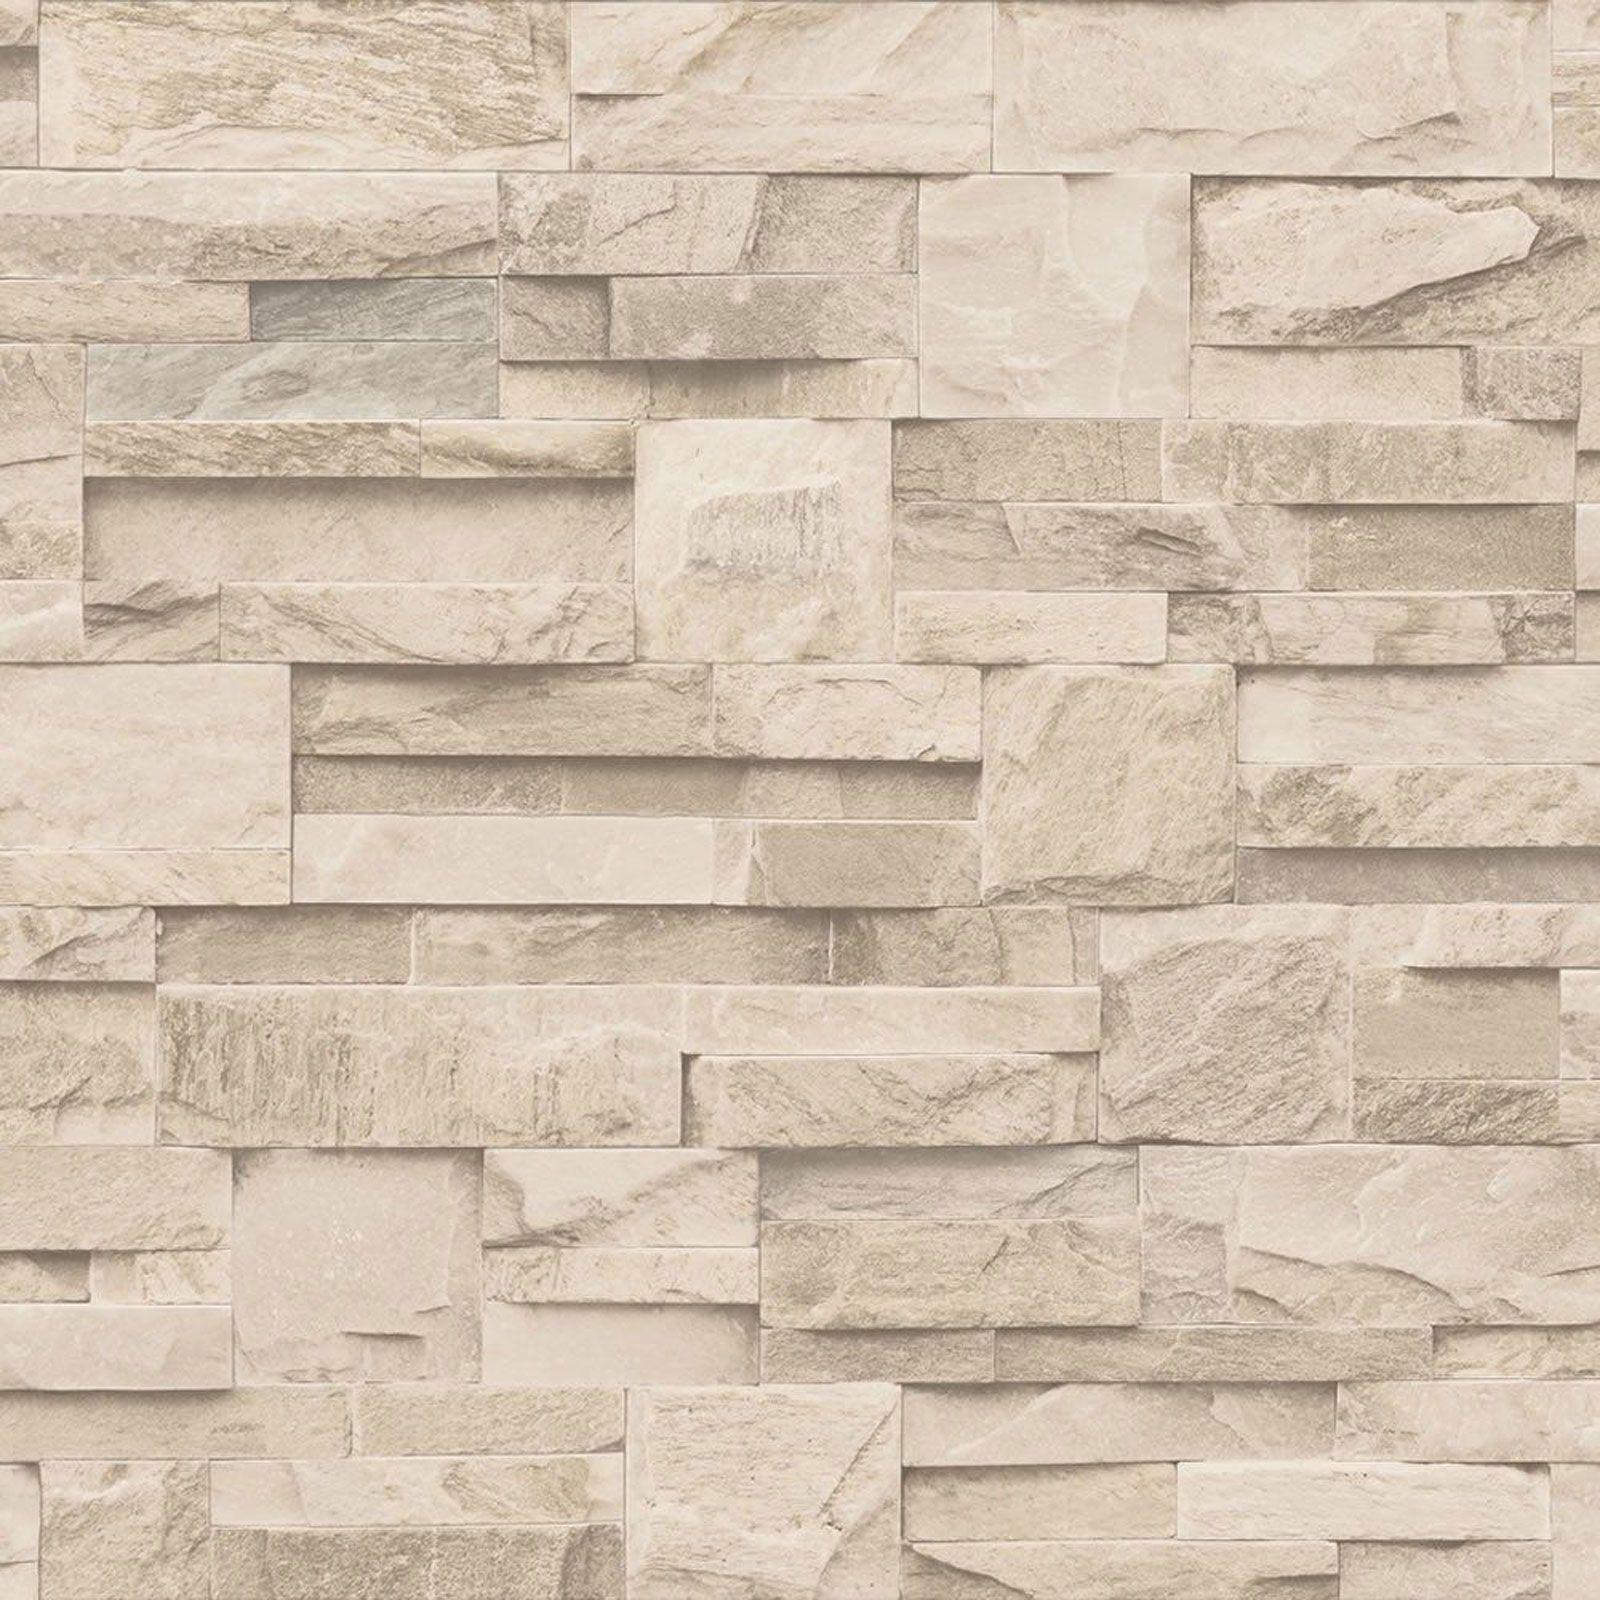 Schiefer Stein Wand Effekt Tapete Modern Wandtapete Grau